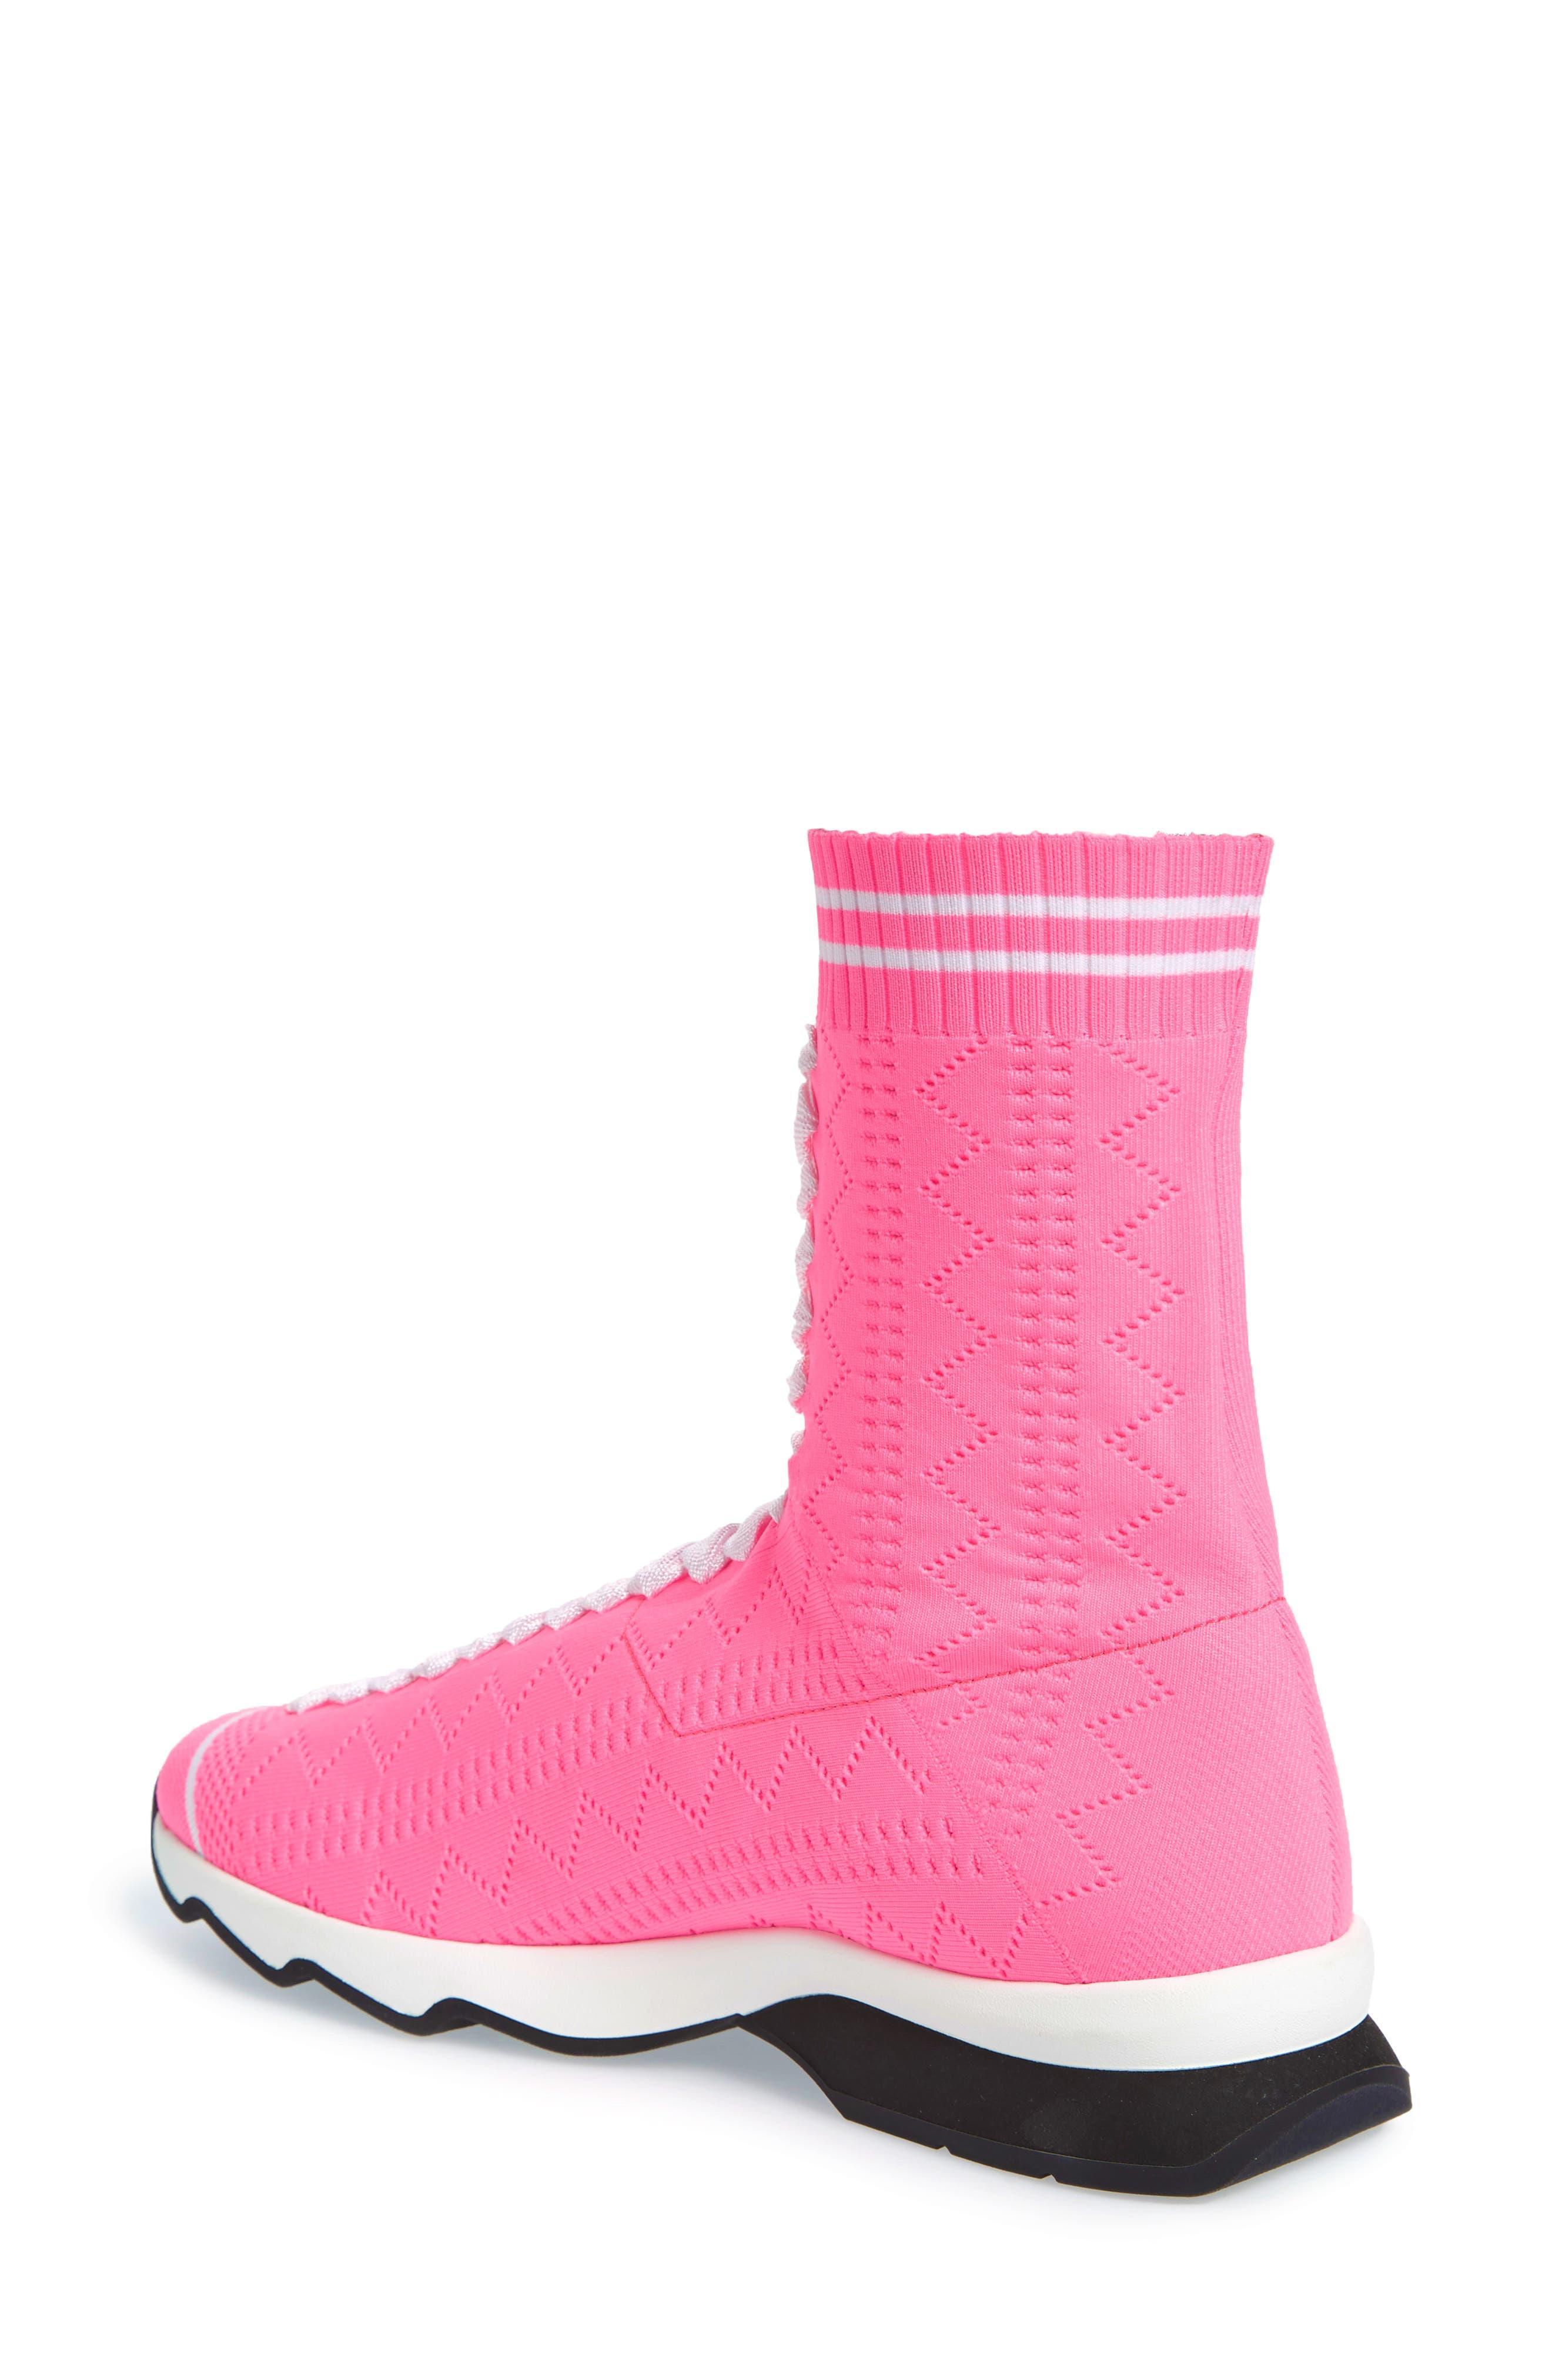 Rocko-Top Sock Sneaker,                             Alternate thumbnail 2, color,                             650